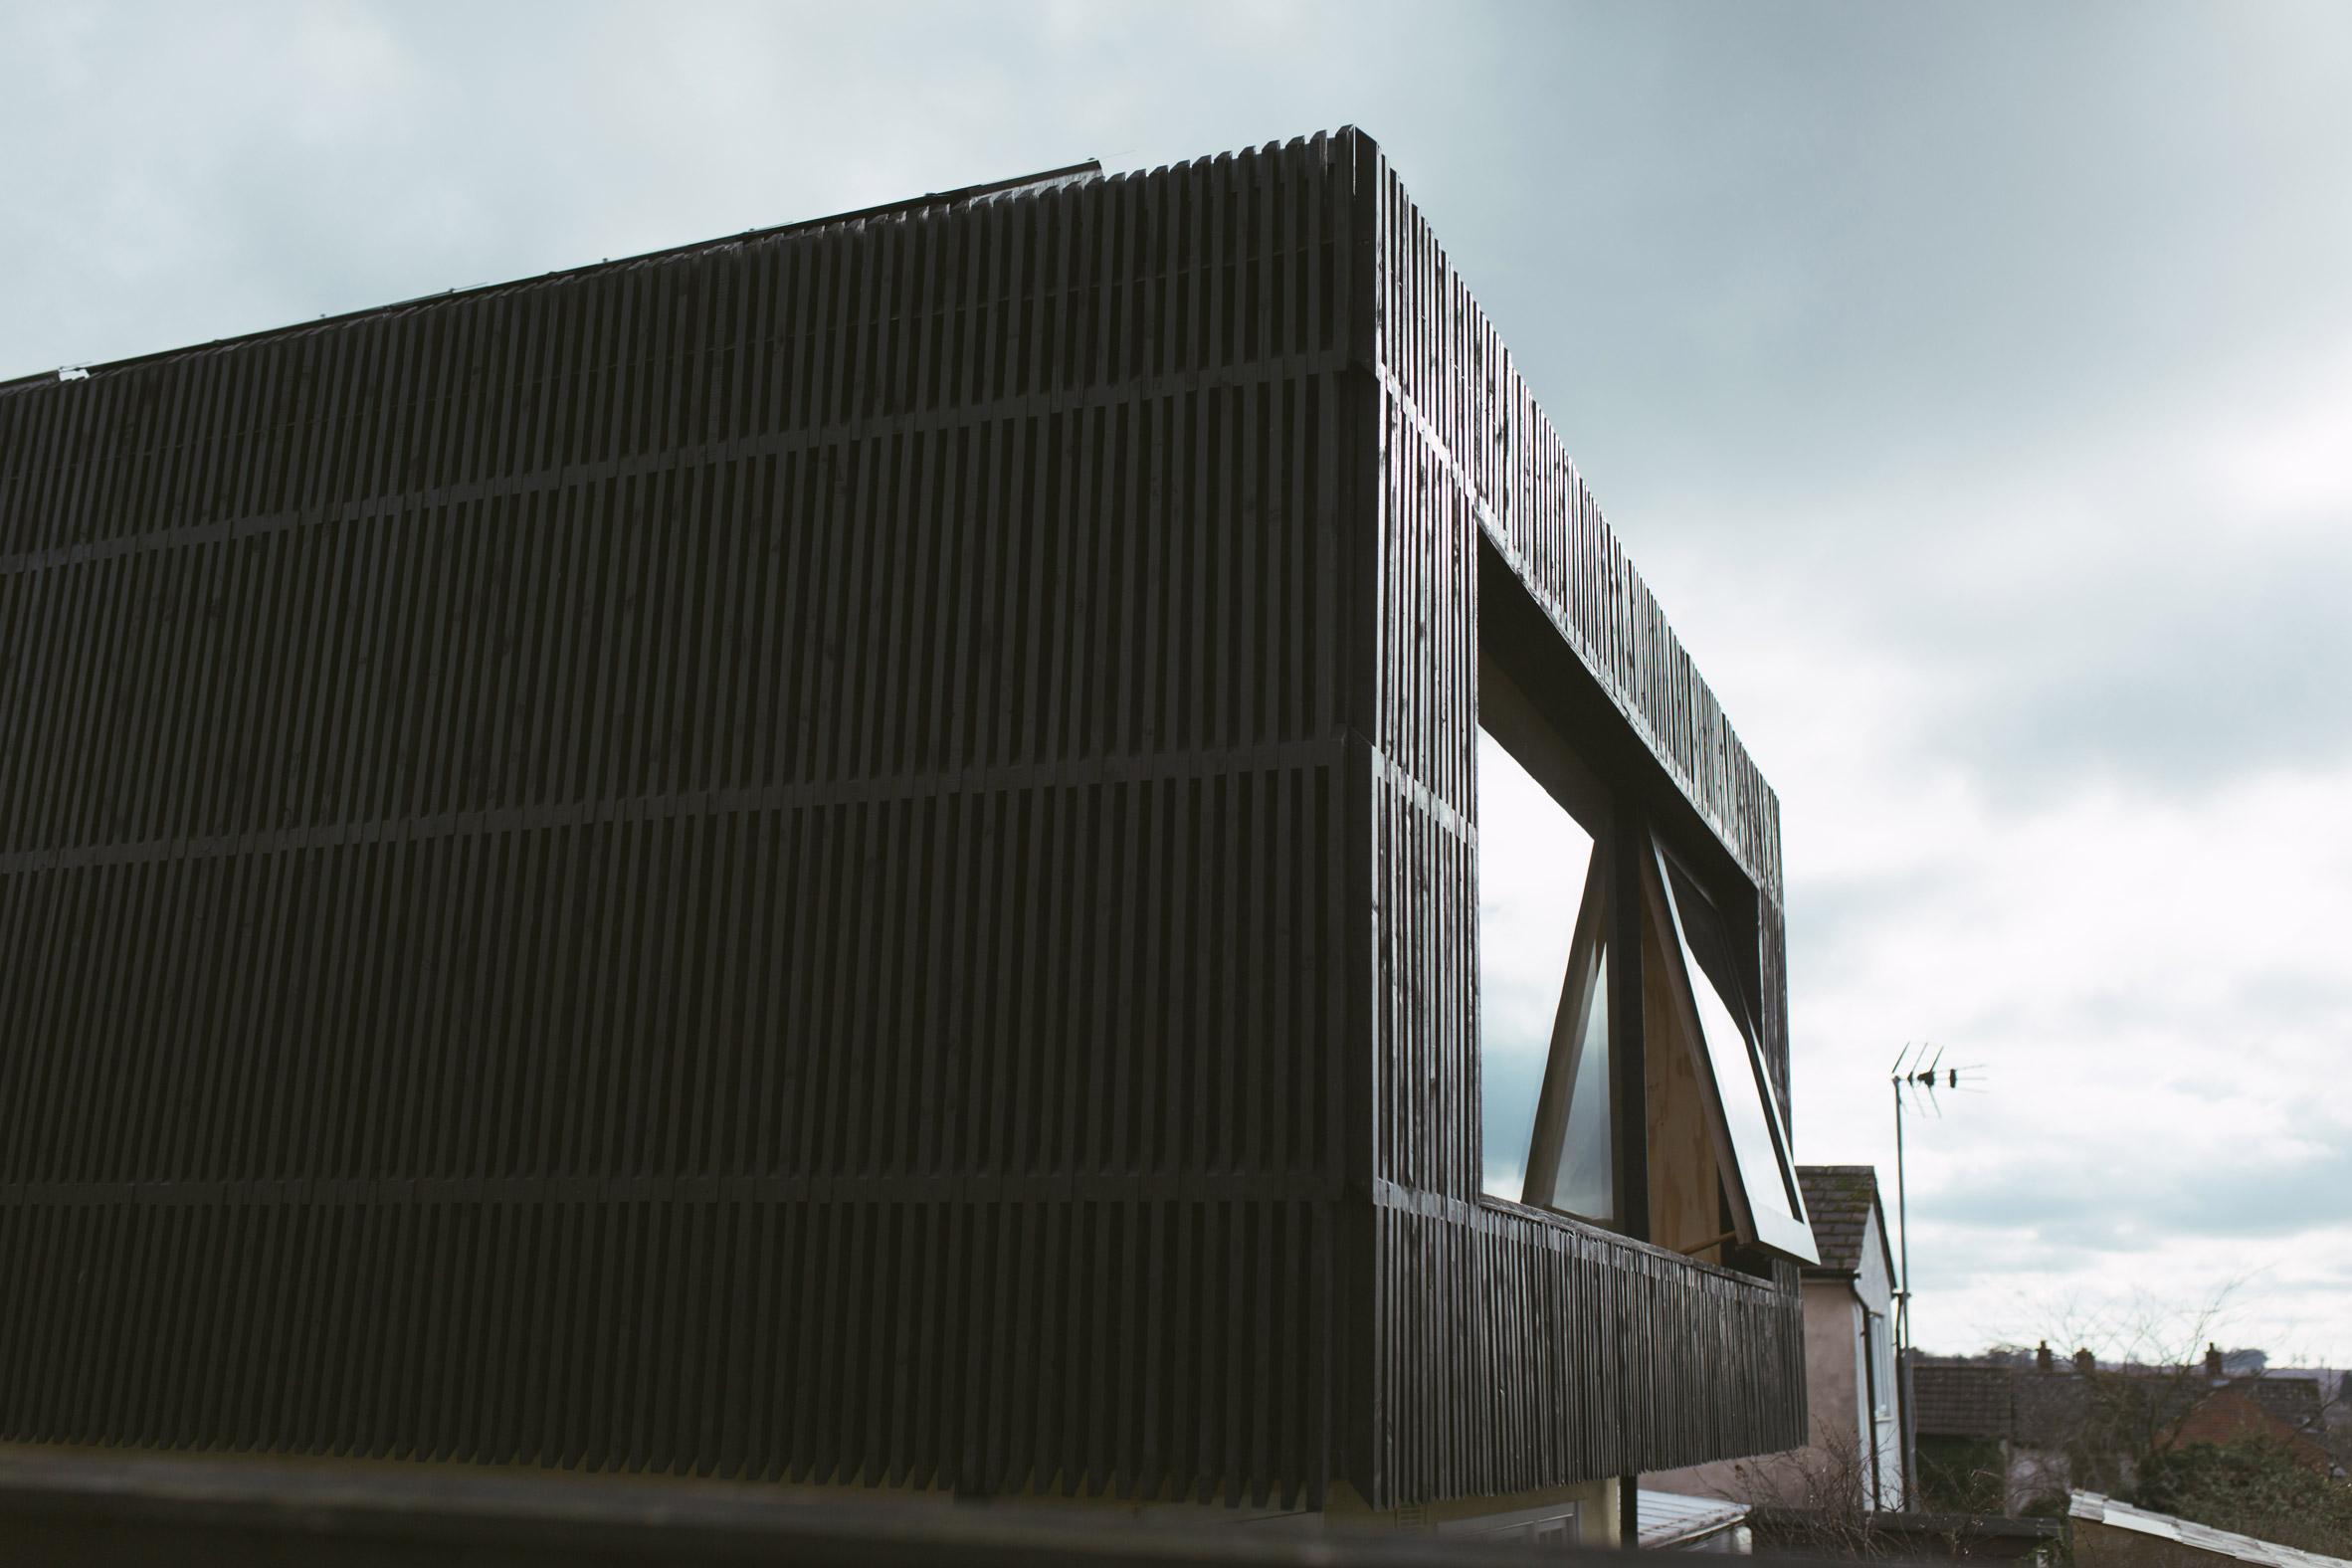 Mill Lane U-Build house extension by Studio Bark